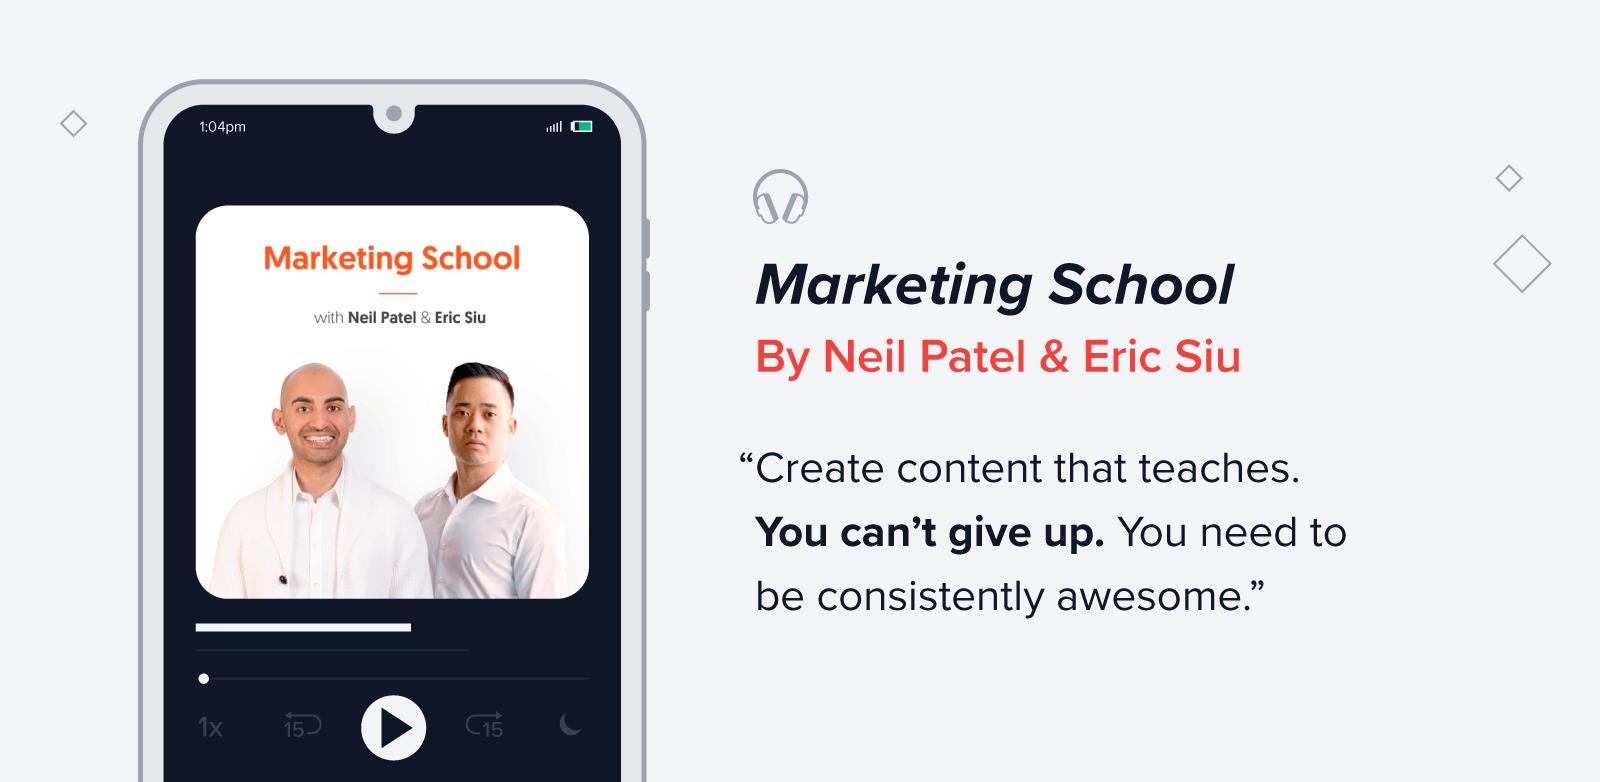 Marketing school podcast quote